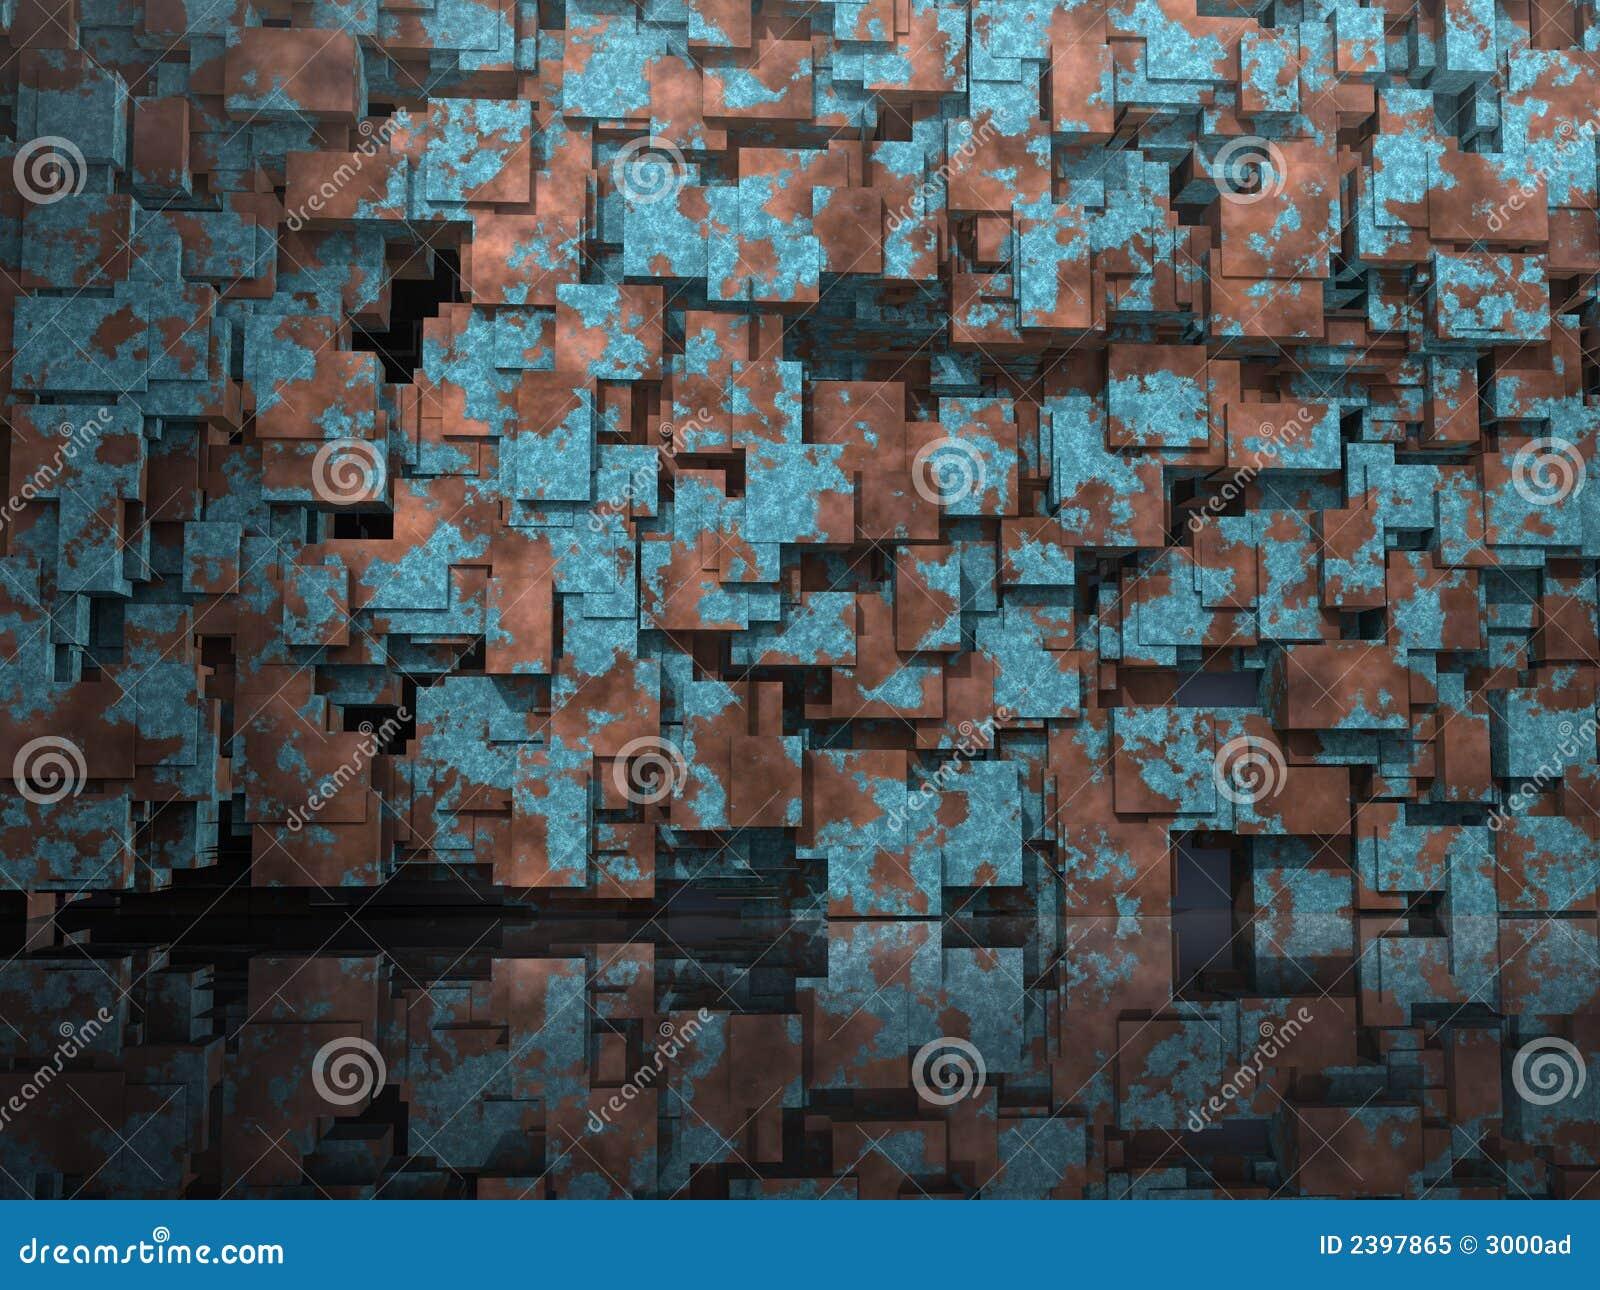 3D Model Background Royalty Free Stock Photo - Image: 2397865